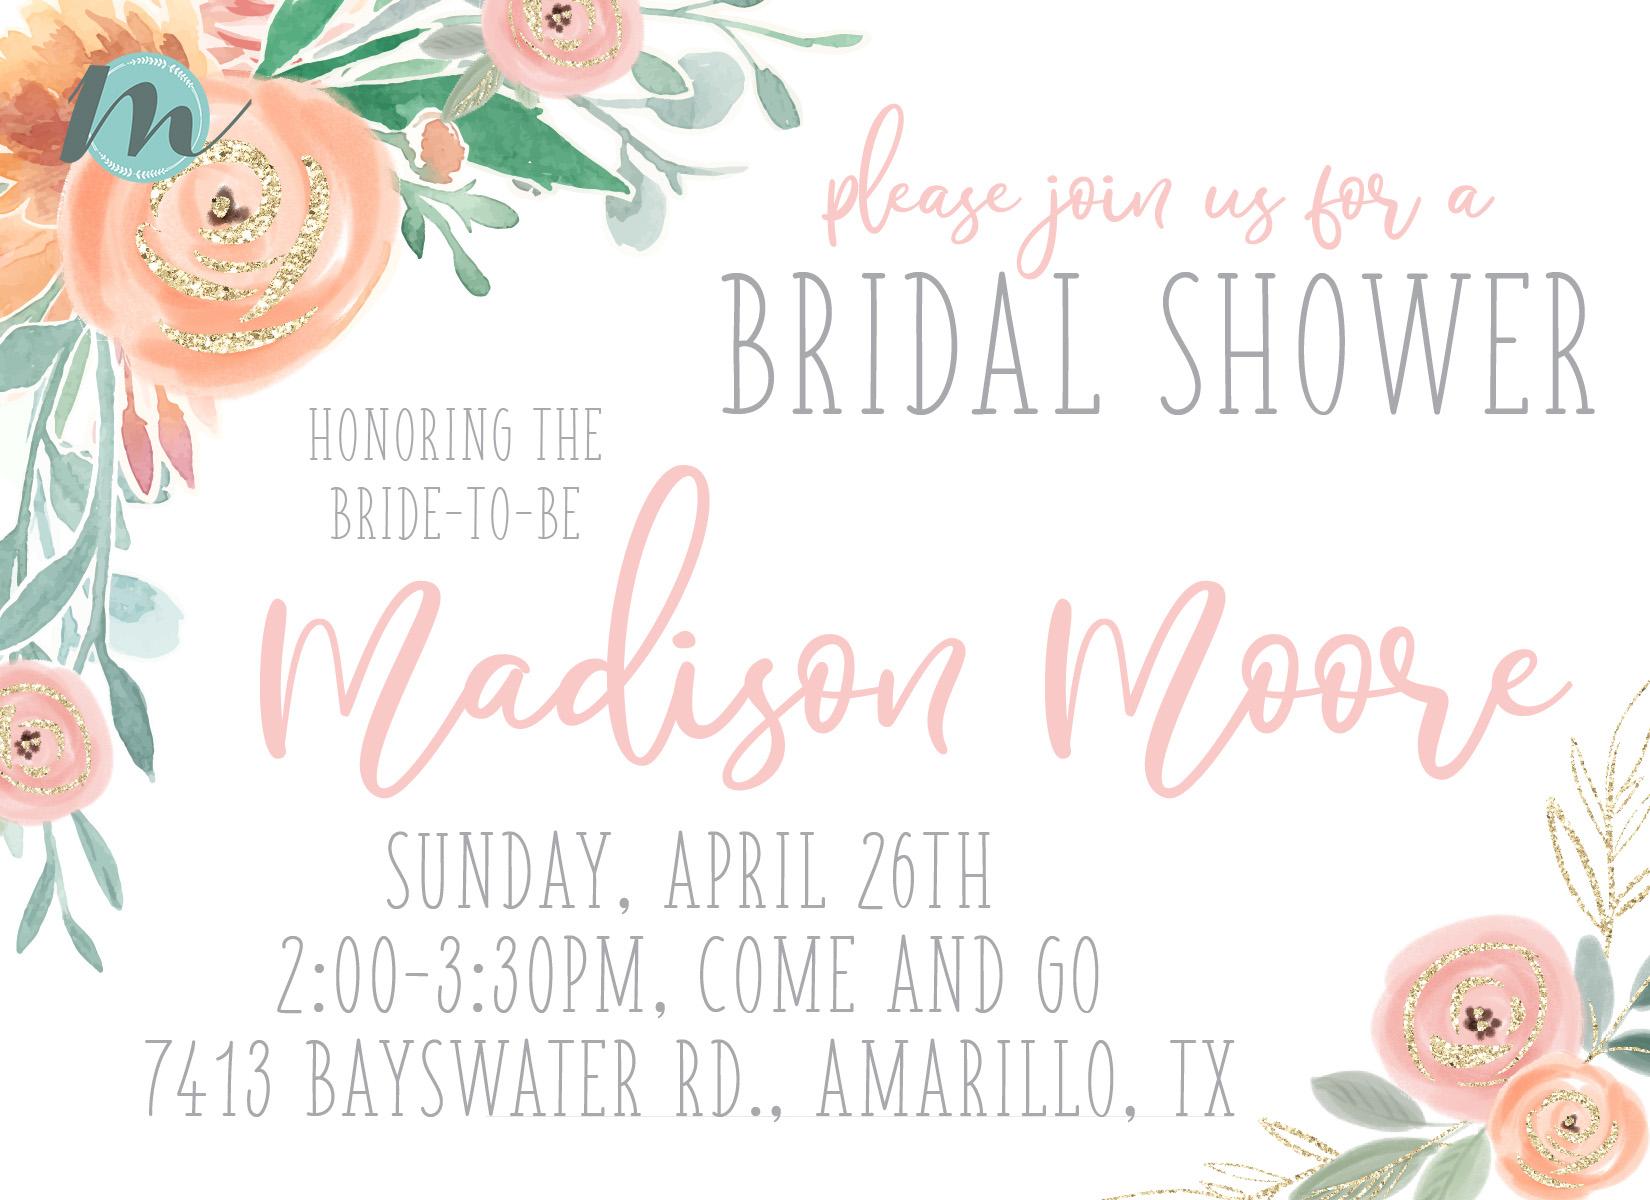 Bridal Shower Postcard_New